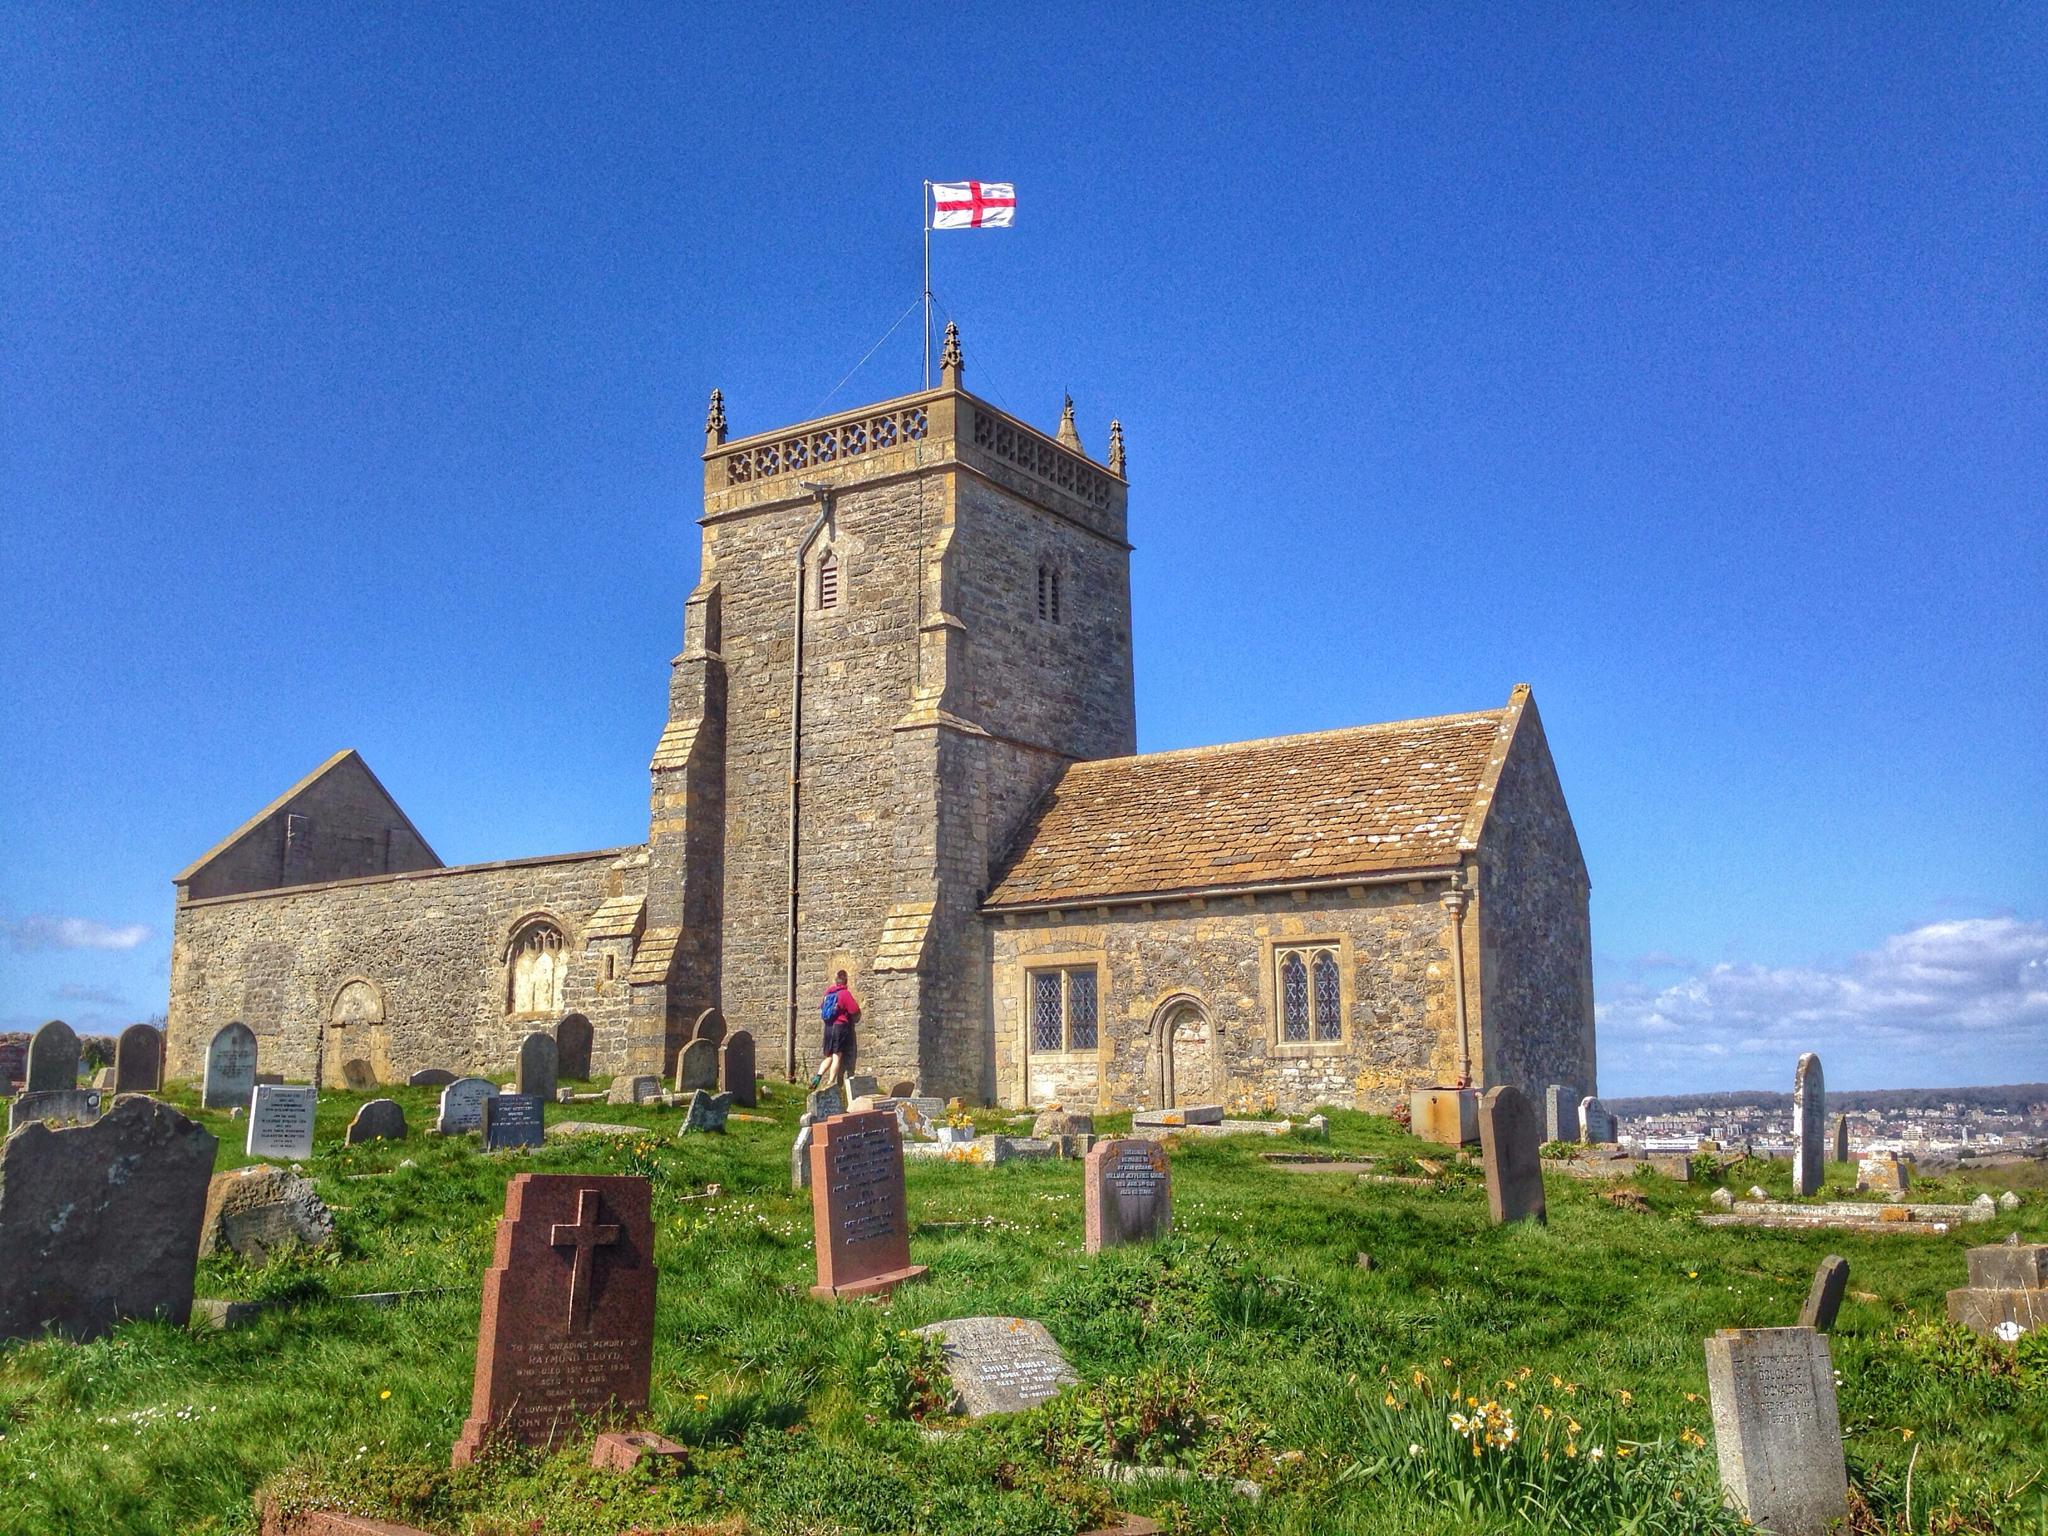 Uphill church  by debi.Moss.3